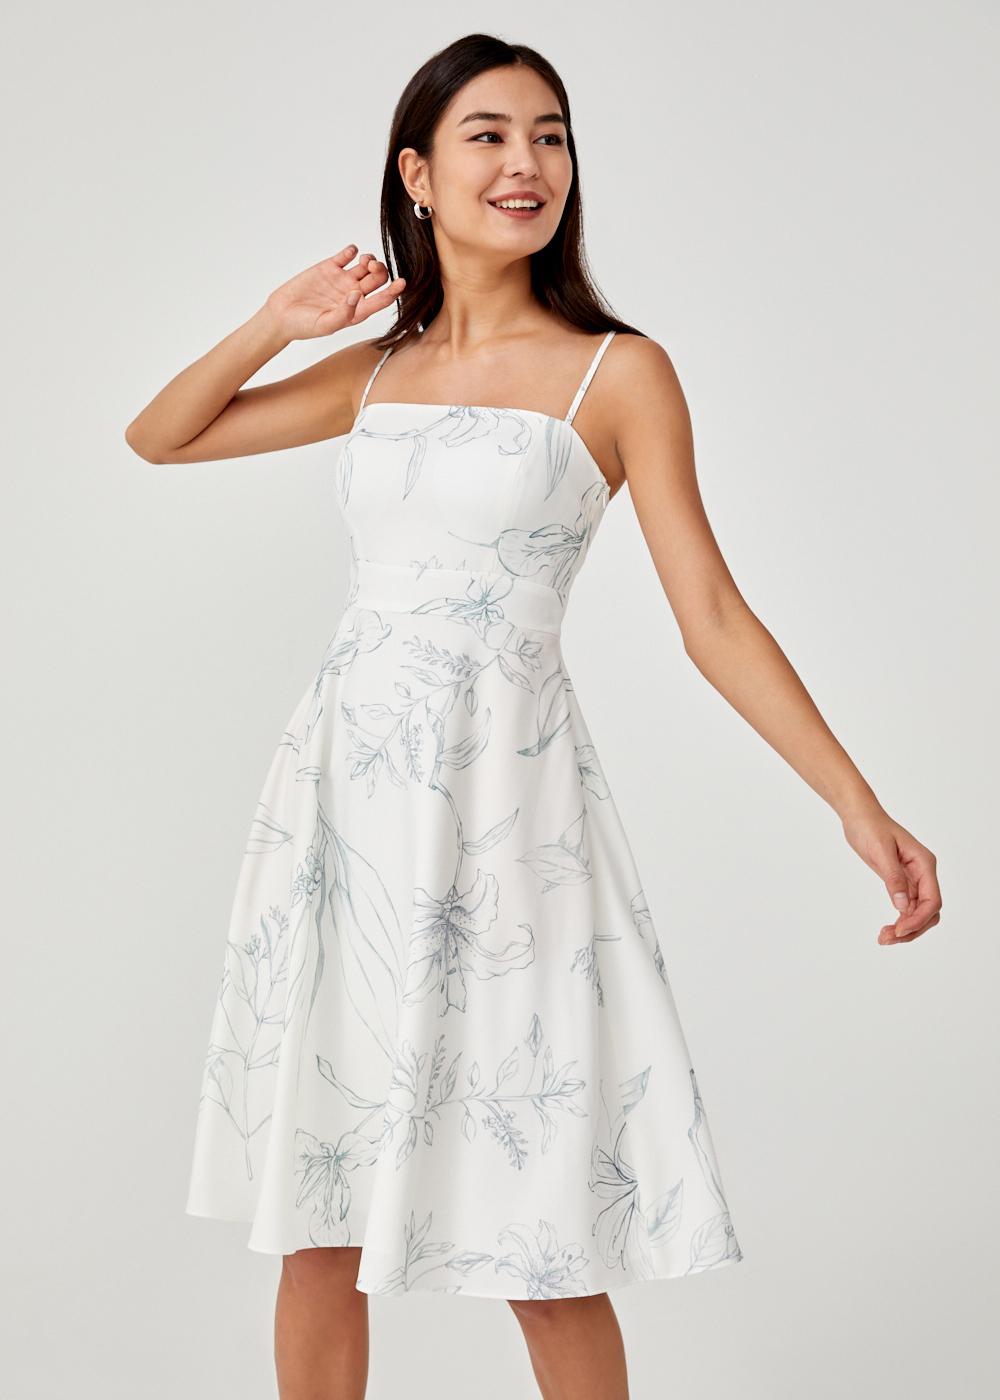 Kyla Camisole Midi Dress in Floral Flutter